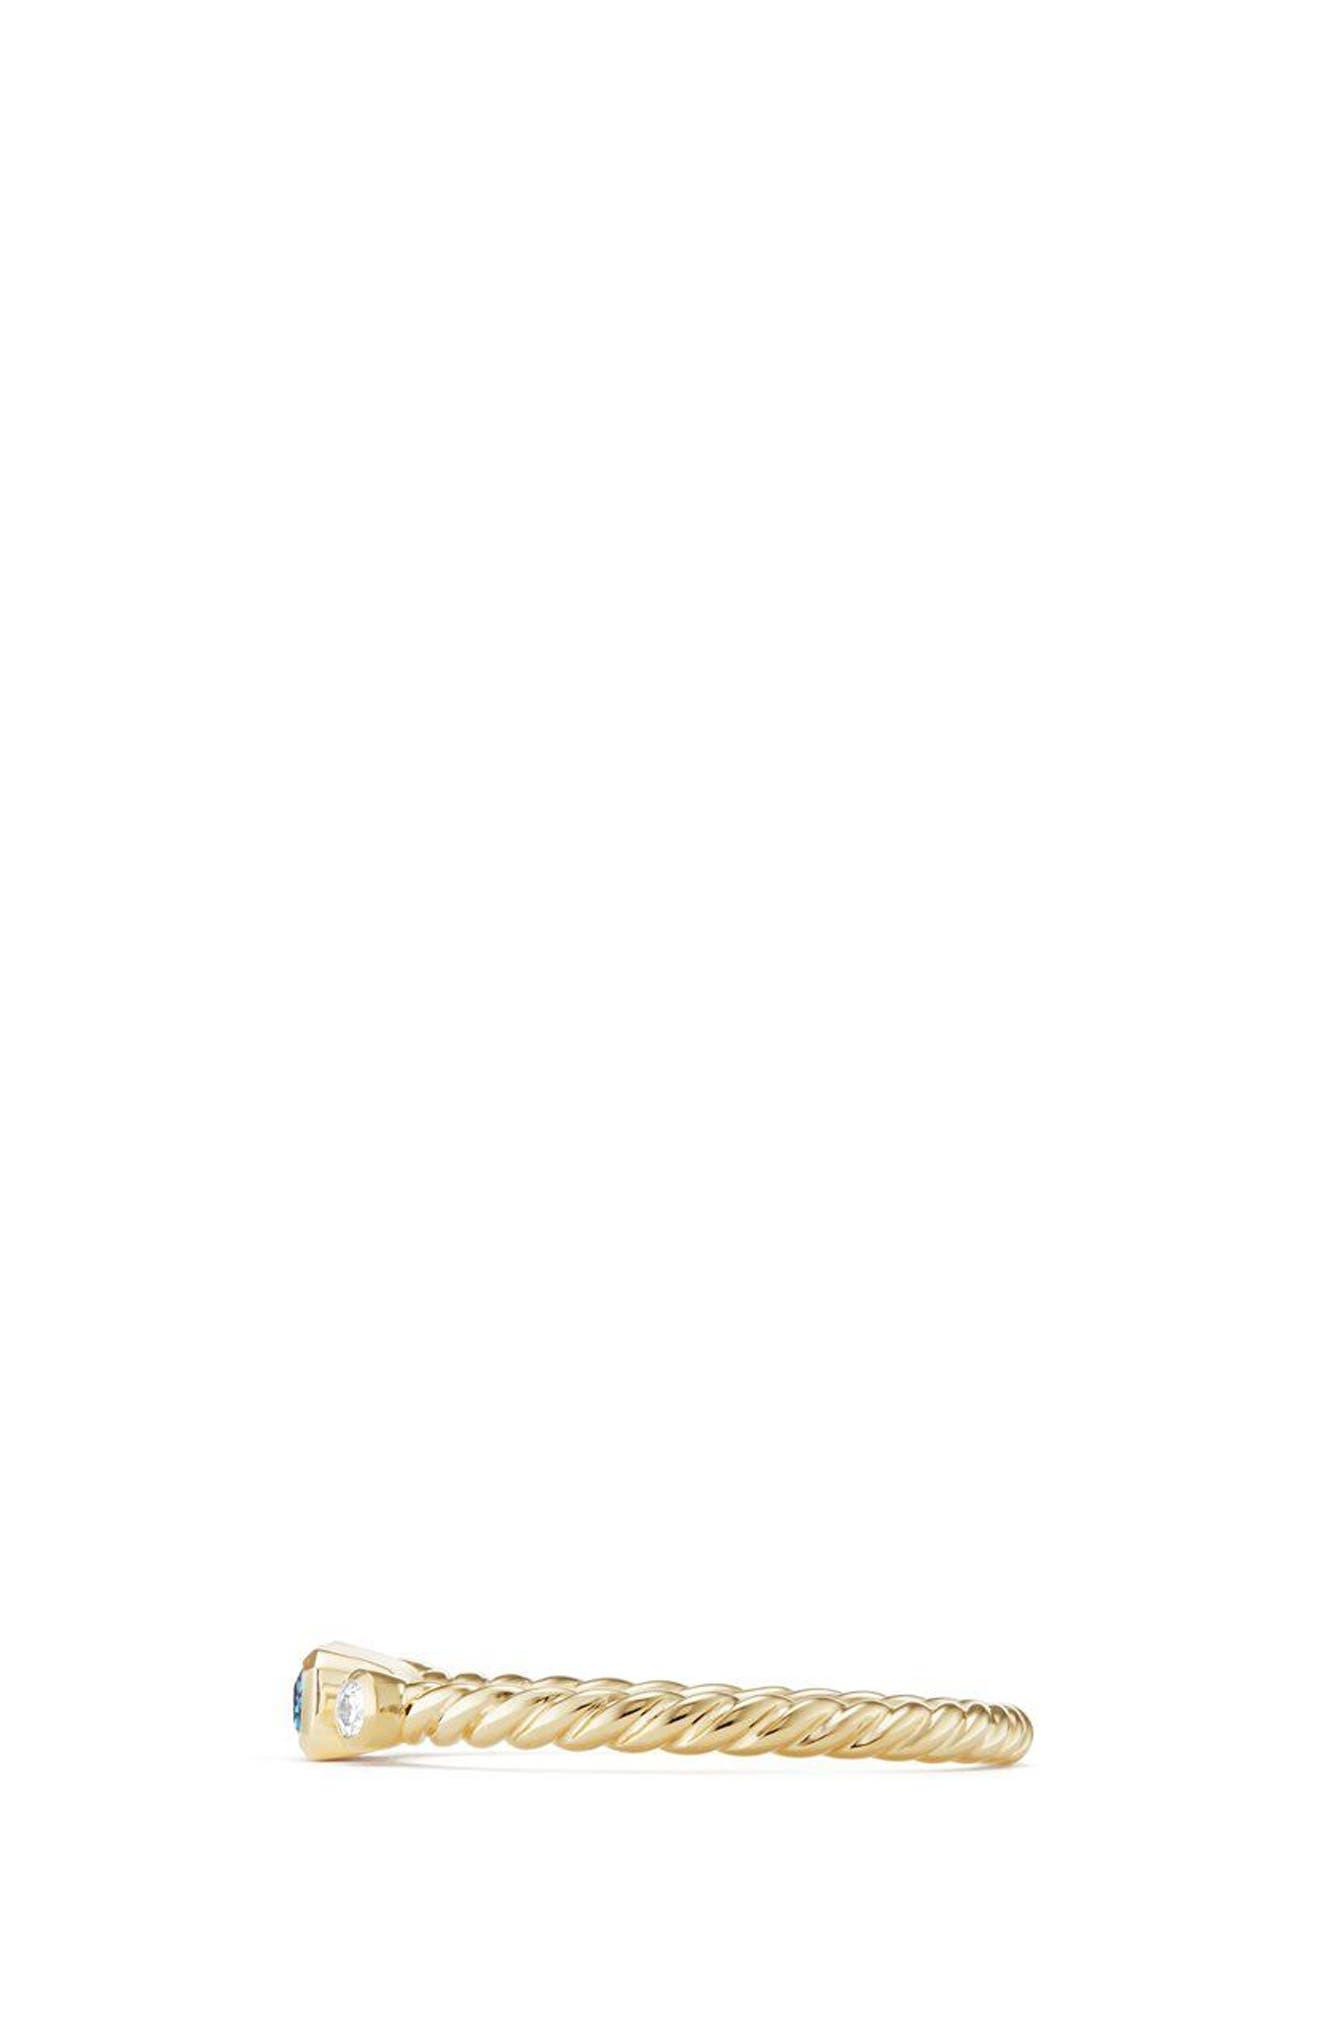 DAVID YURMAN, Novella Ring in 18K Gold, Alternate thumbnail 2, color, GOLD/ DIAMOND/ BLUE TOPAZ